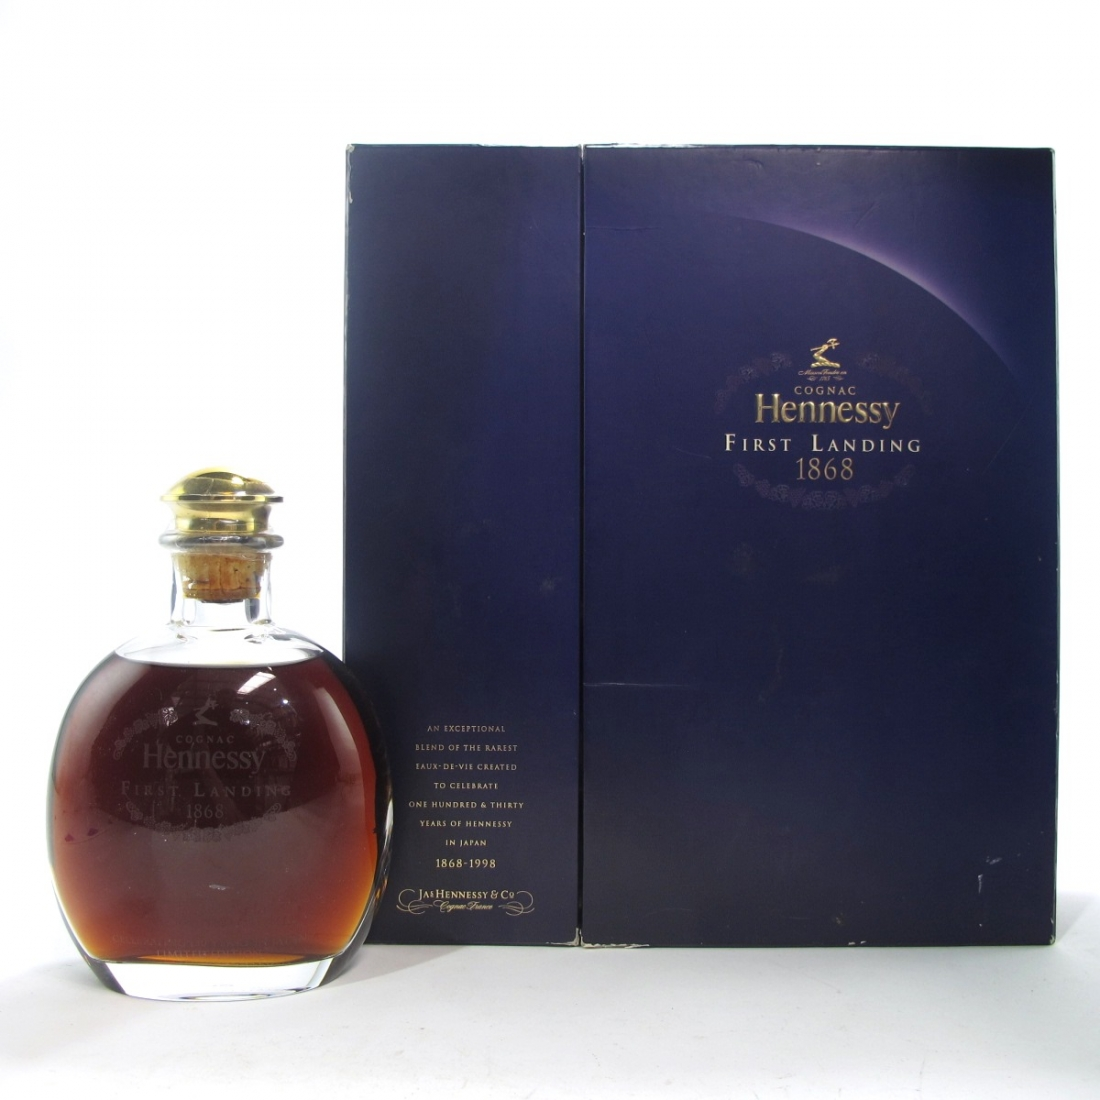 Hennessy First Landing